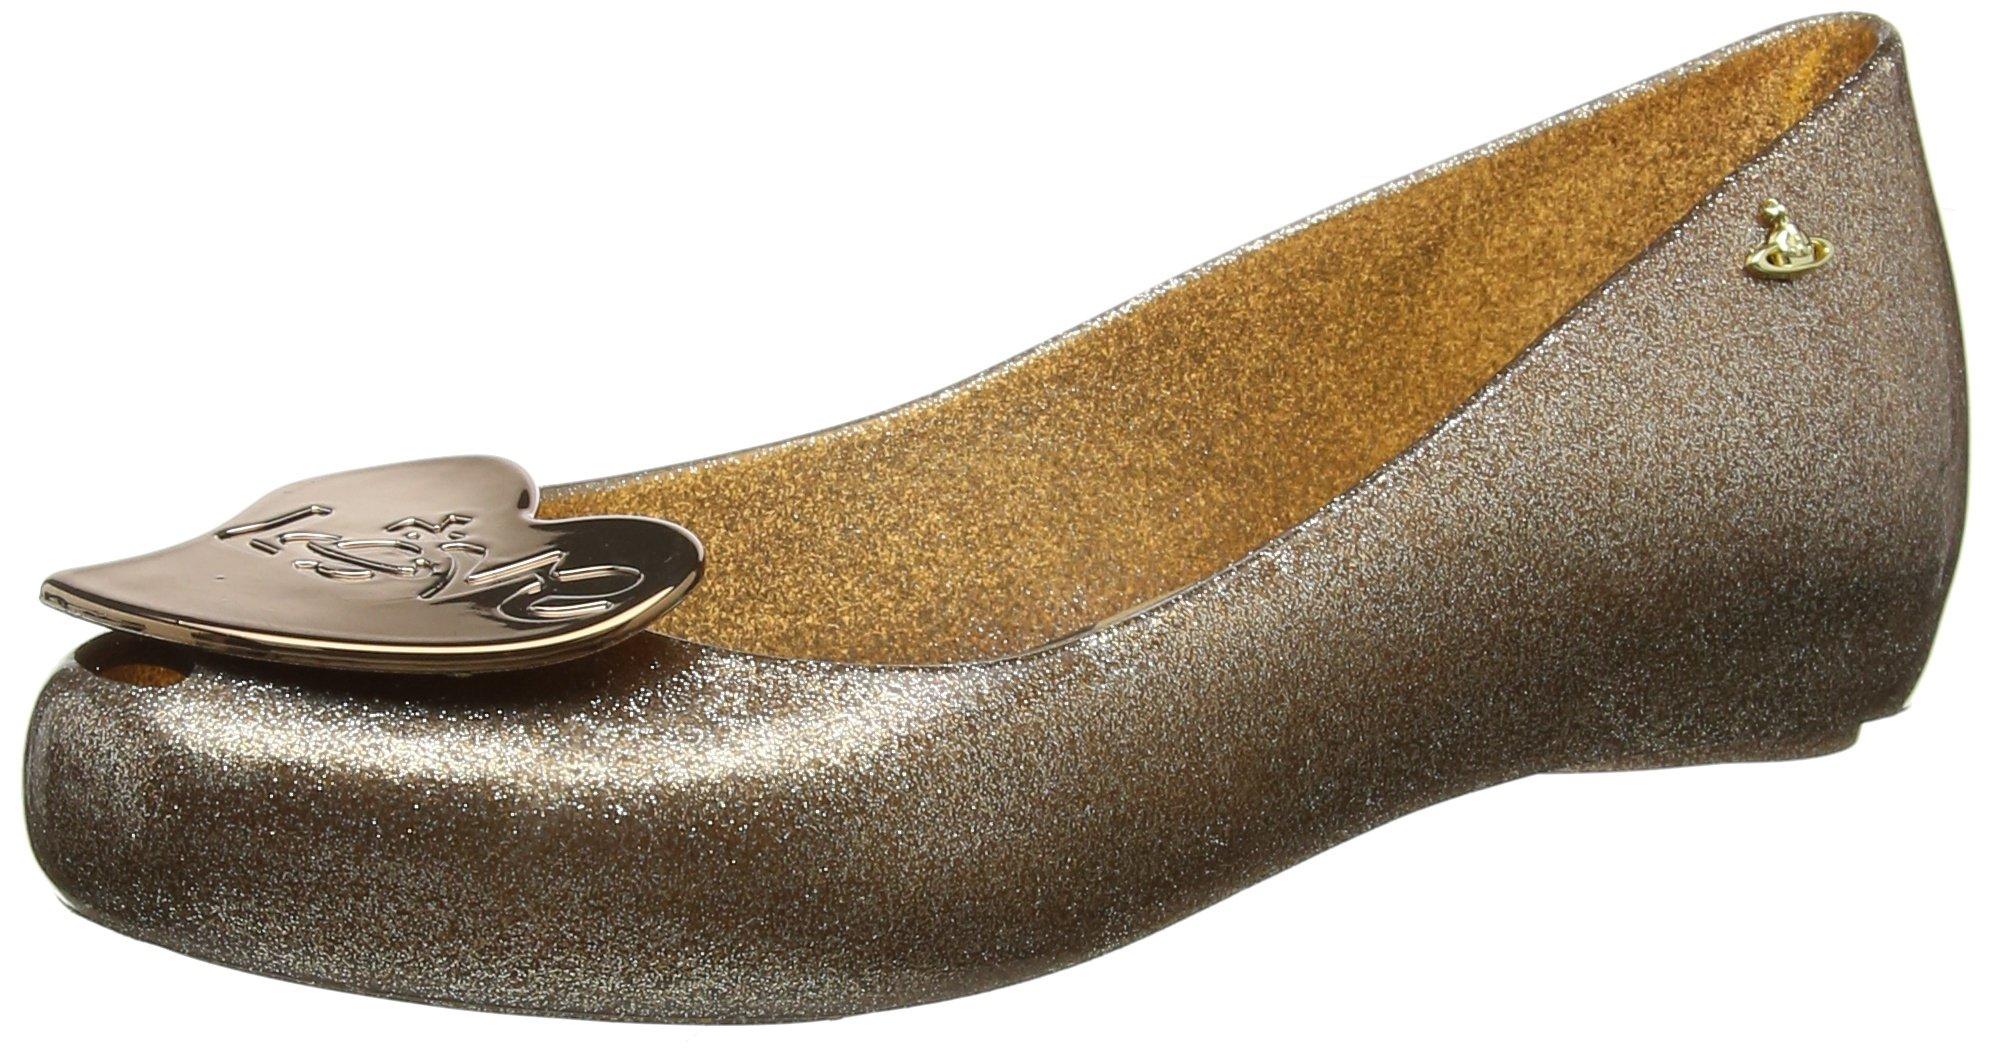 Melissa Vivienne Westwood Ultragirl Love 18 Womens Shoes Metallic